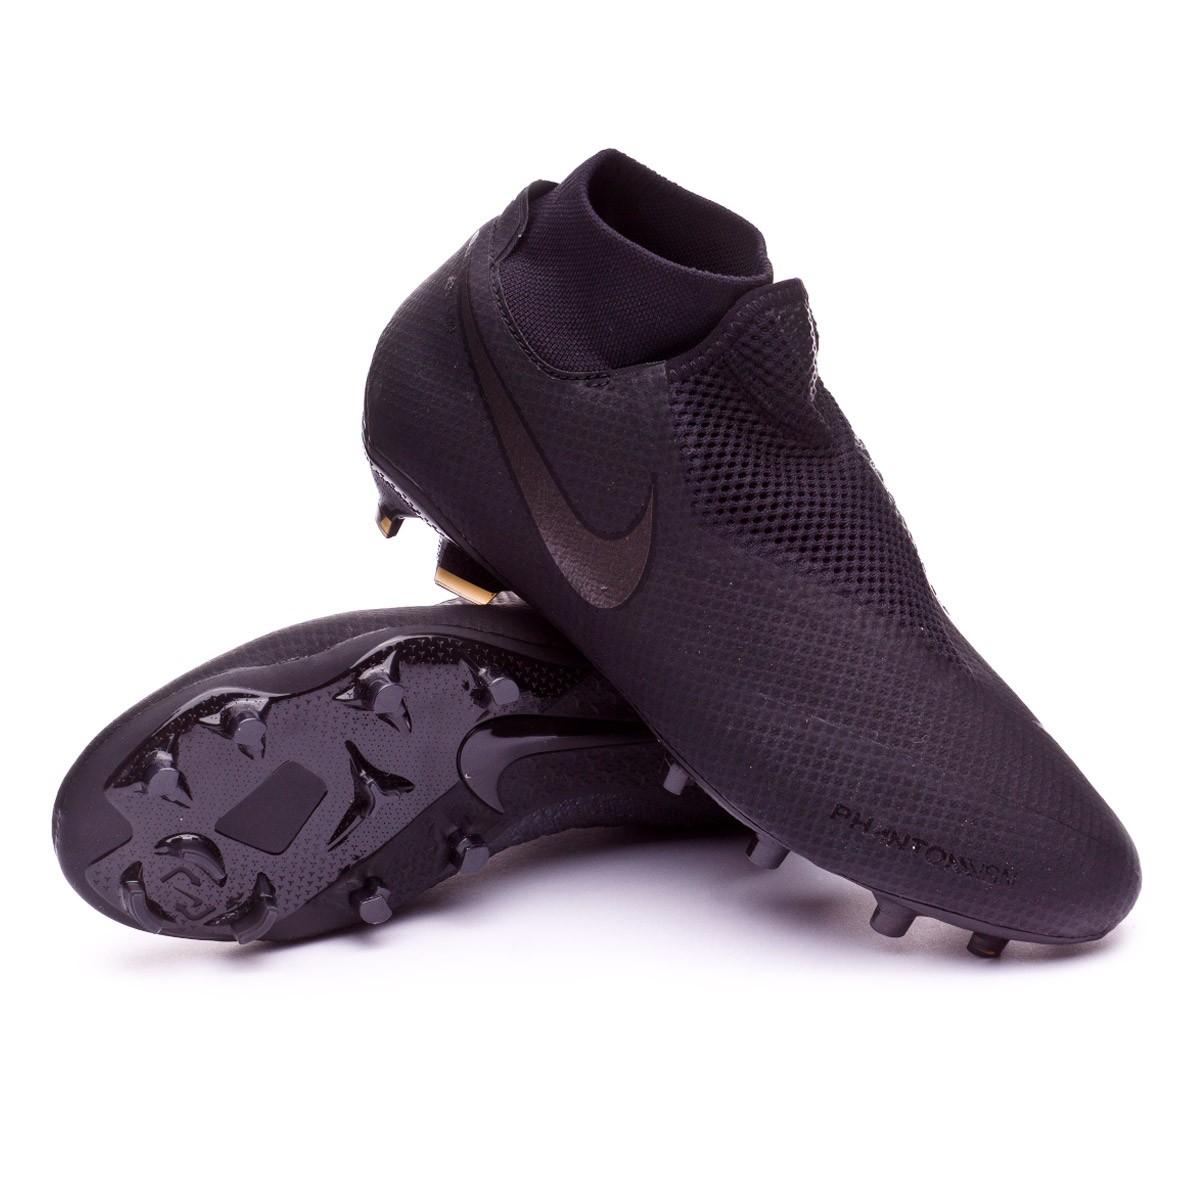 700c5da91 Football Boots Nike Phantom Vision Pro DF FG Black - Tienda de fútbol  Fútbol Emotion